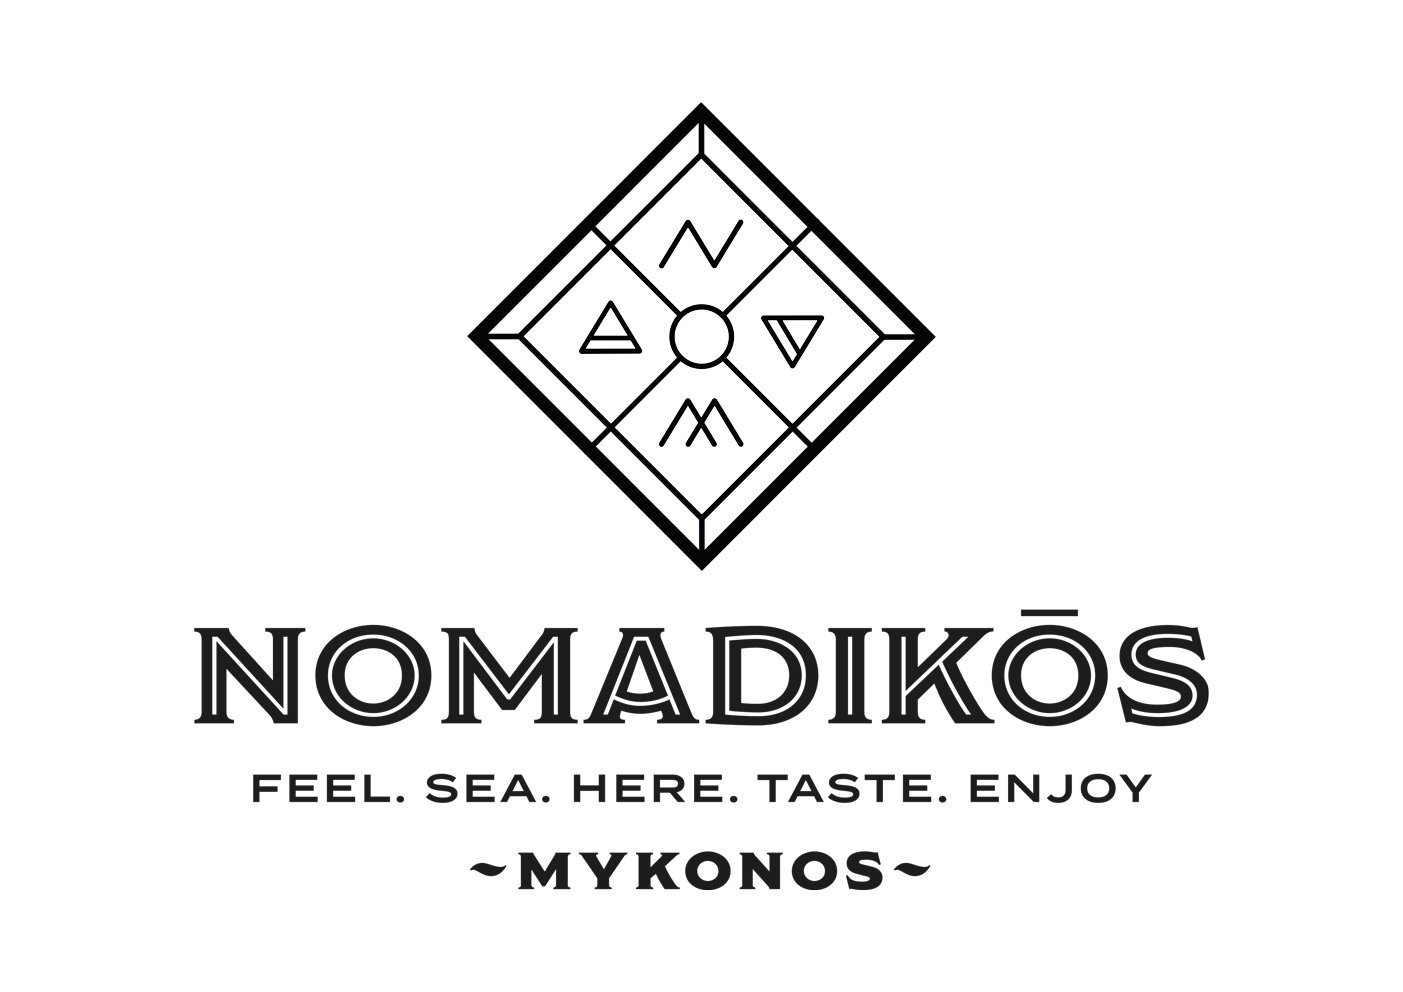 nomadikos_concept1.jpg